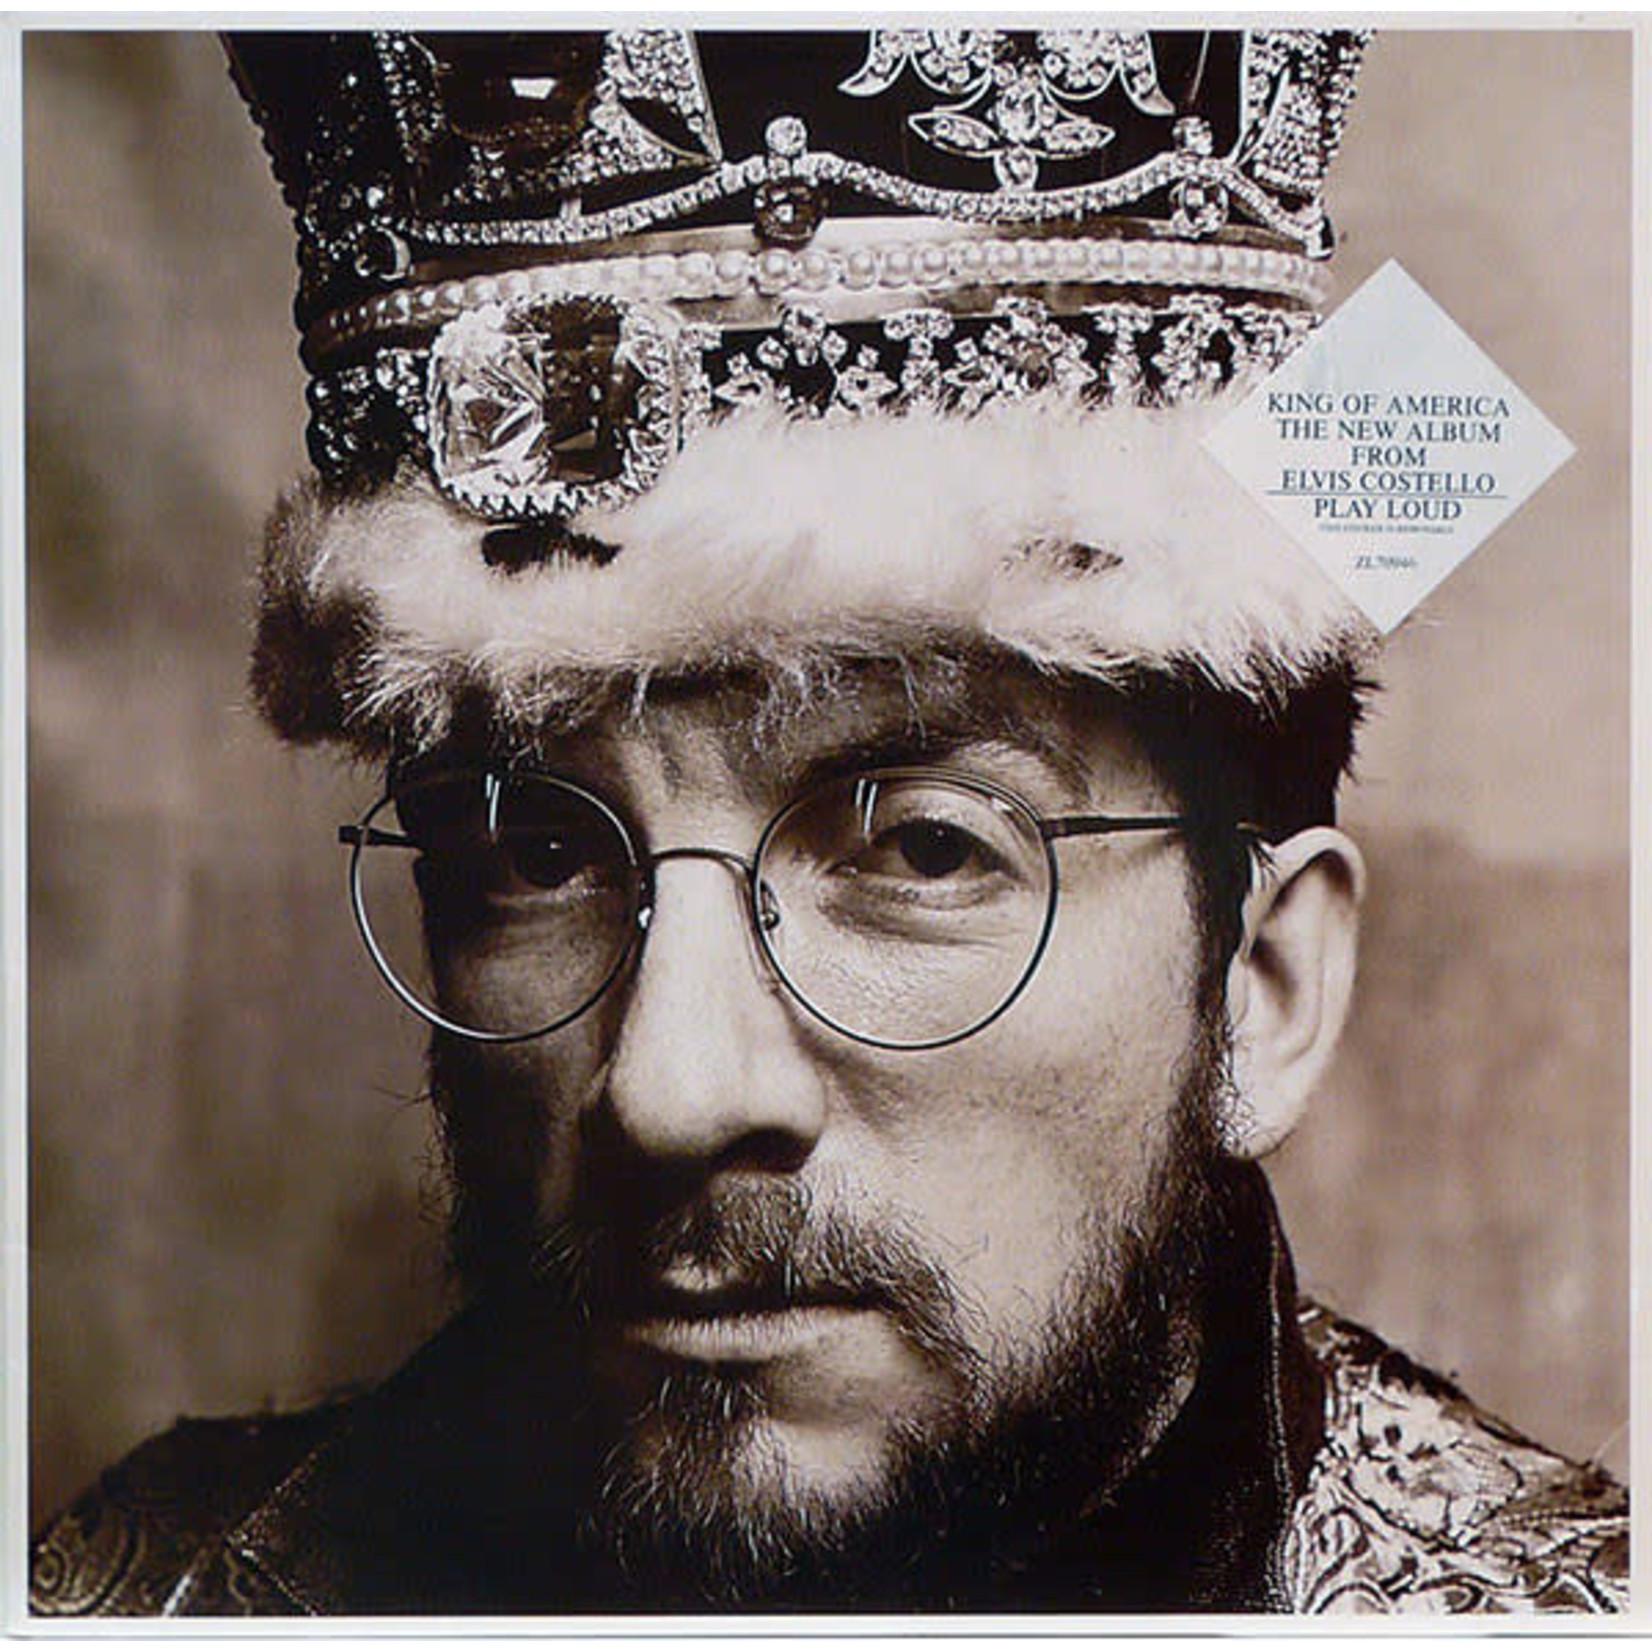 [Vintage] Costello, Elvis: King of America